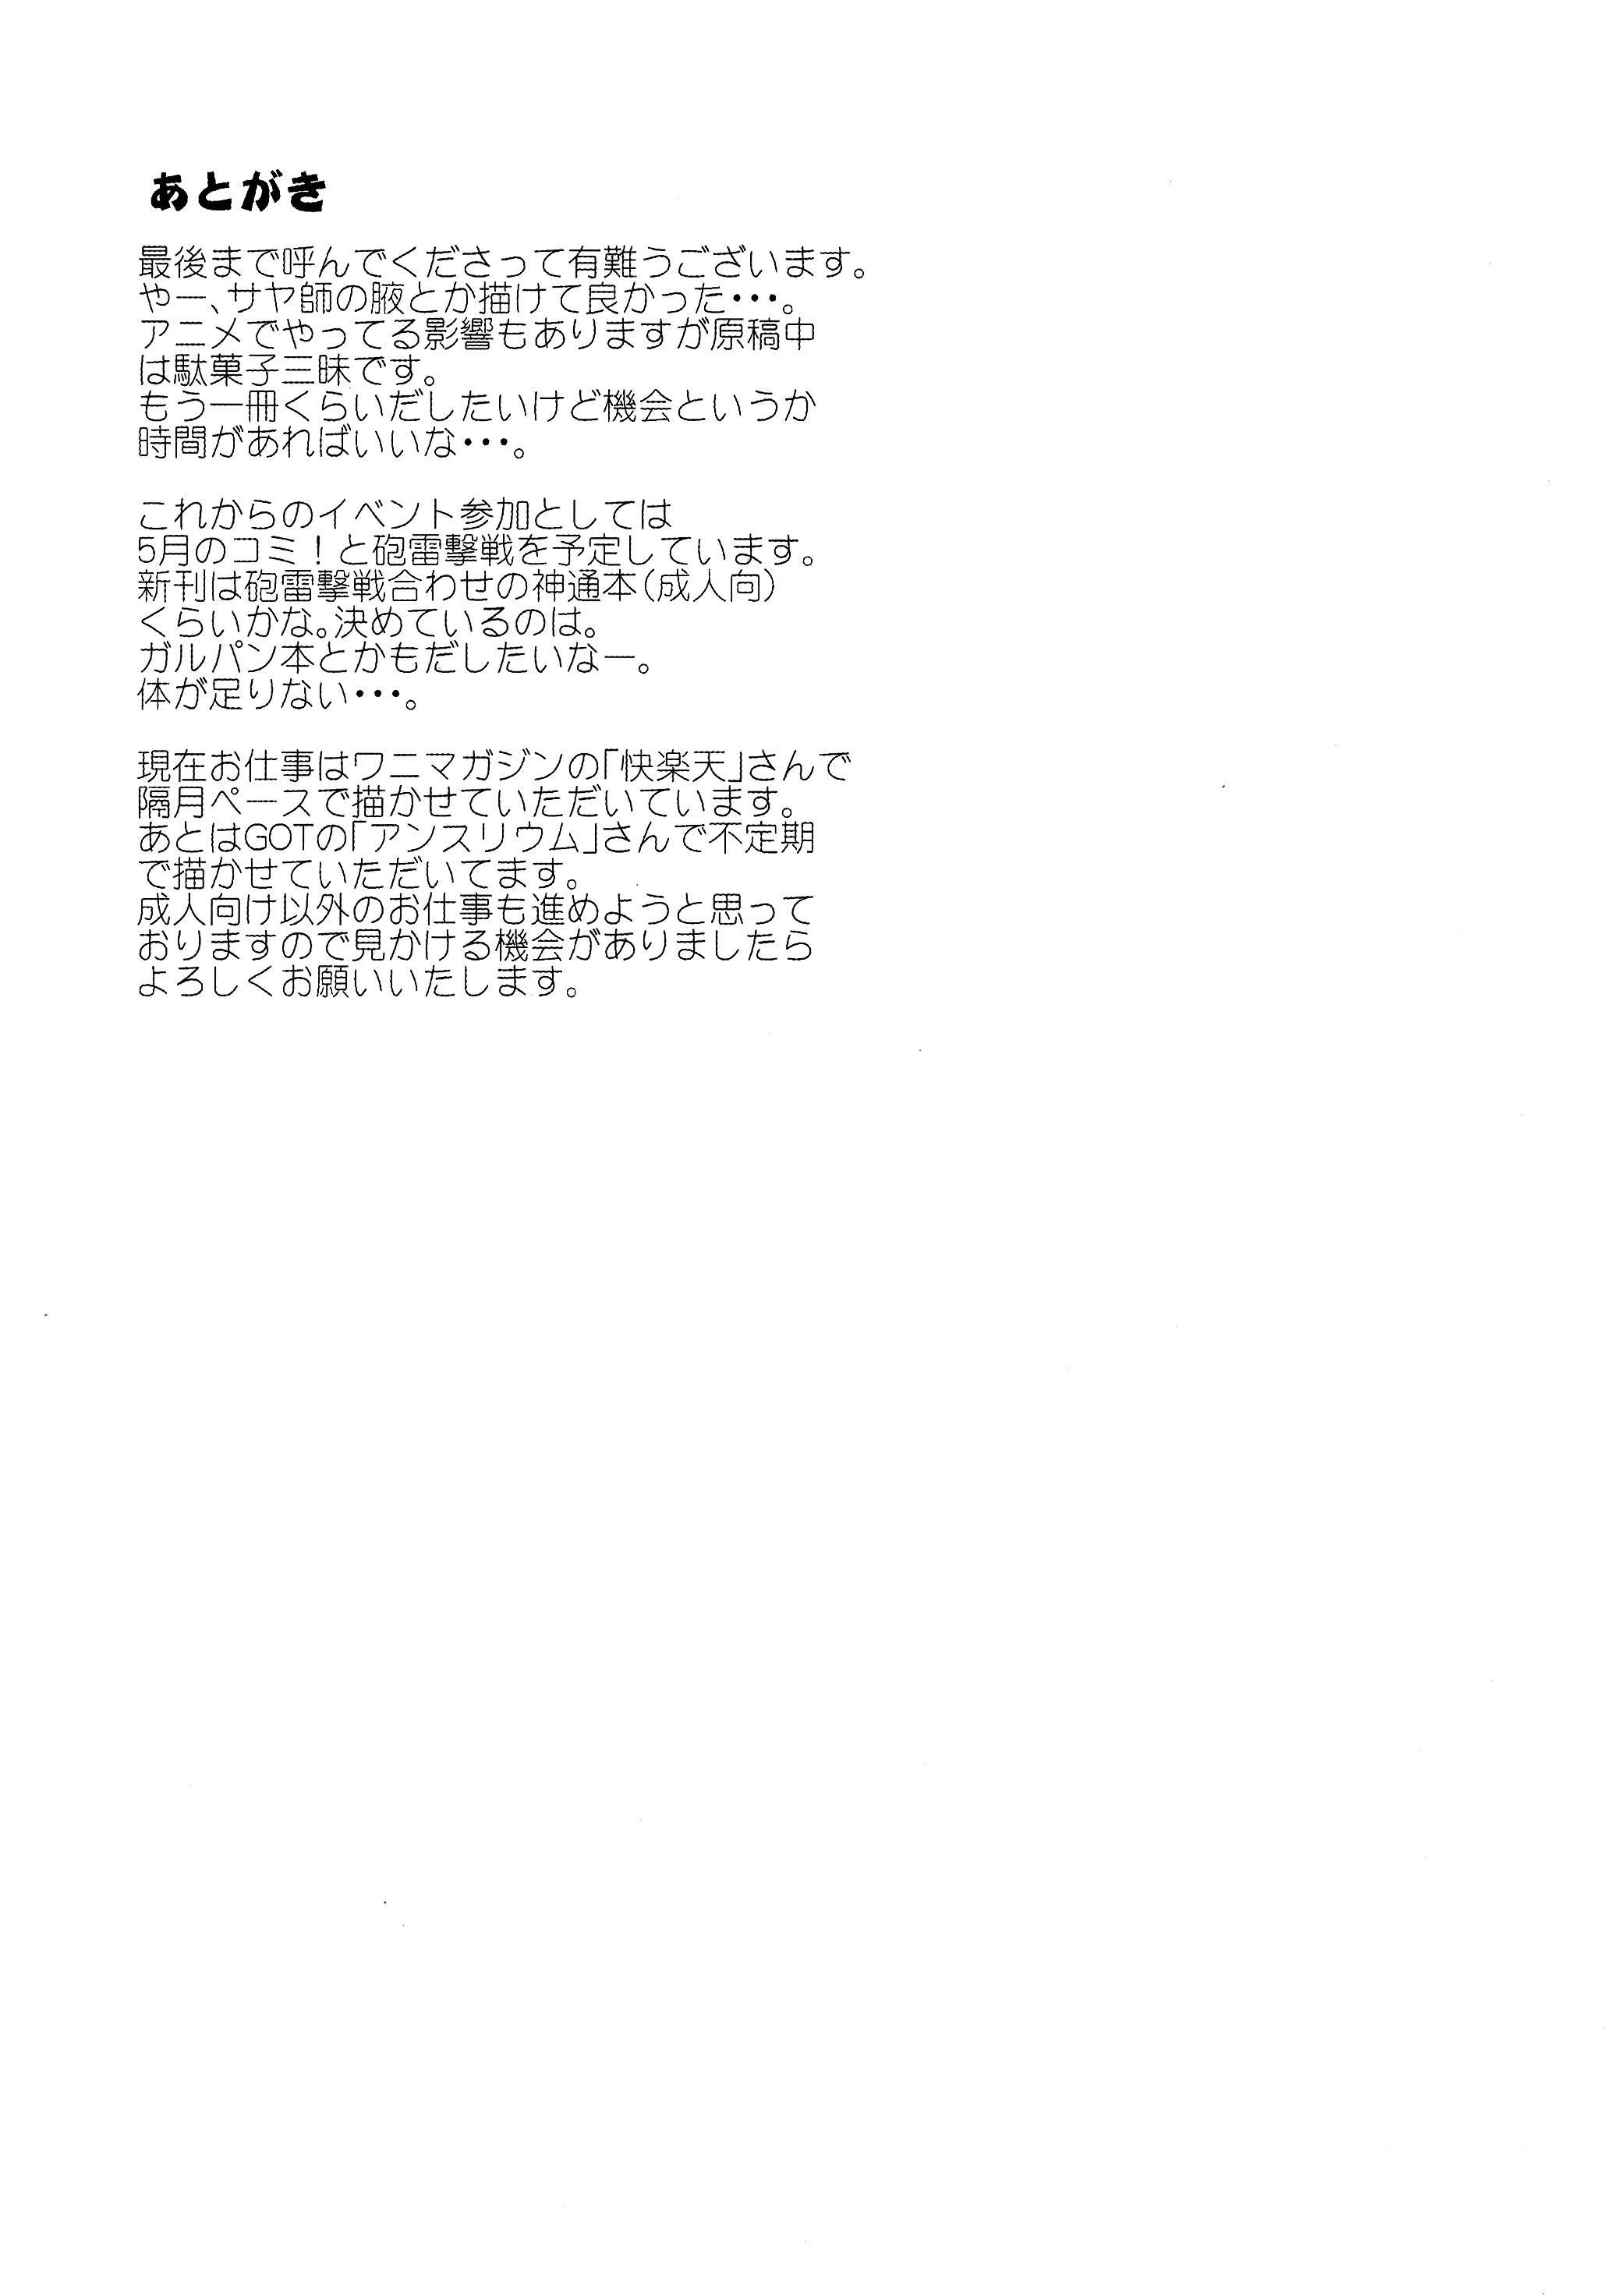 Sayashi Dashi 20